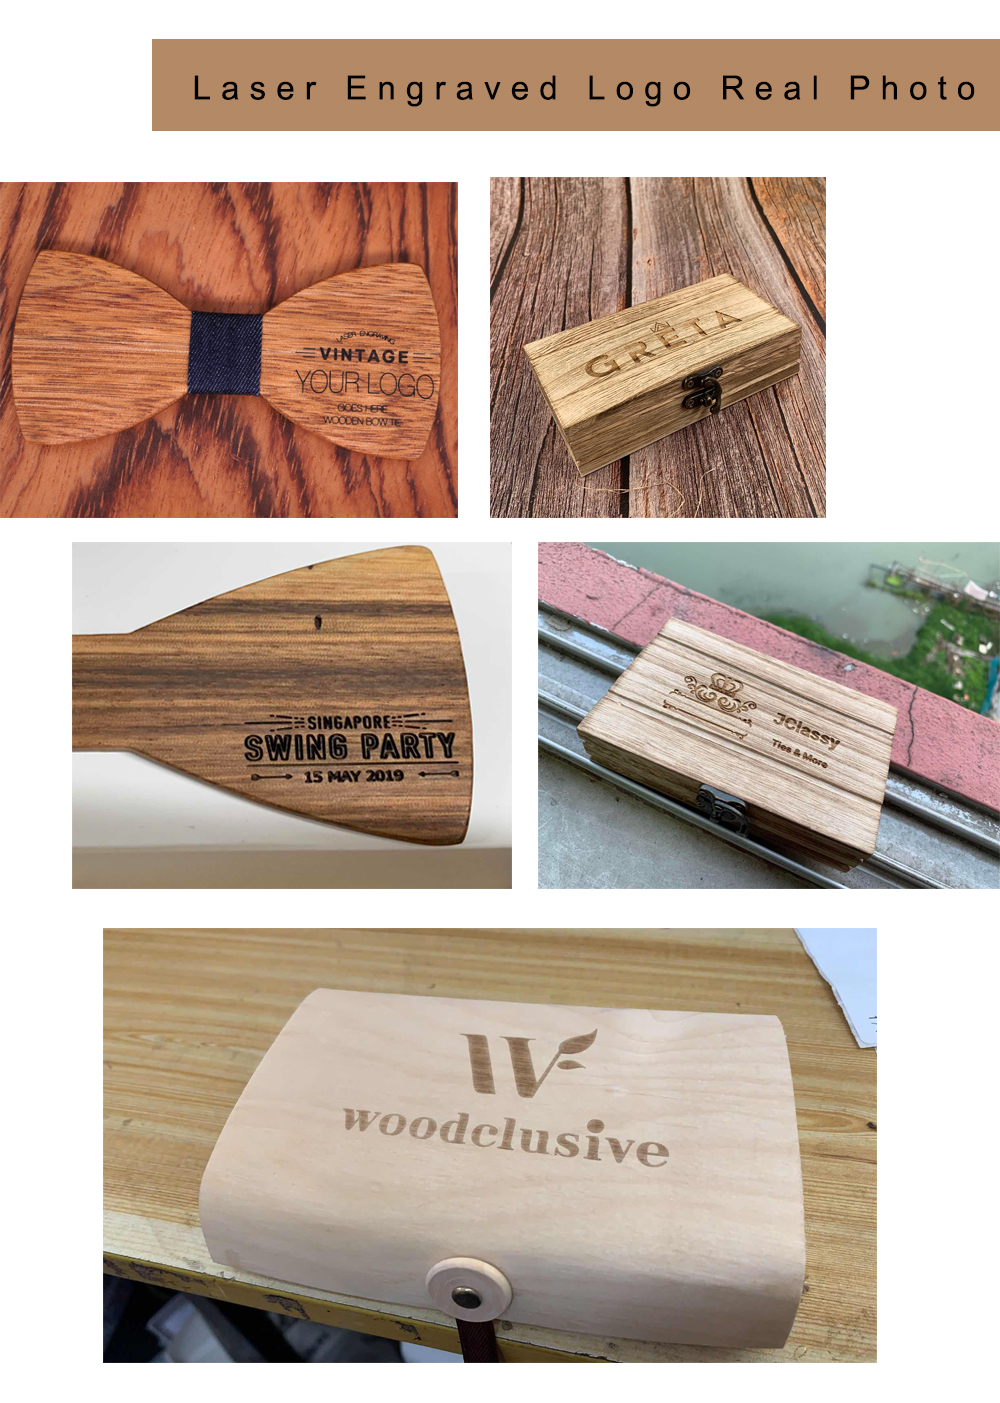 Walnut Wood France LYON Skyline Wooden Bow ties Butterfly Gravata Skyline Ties For Men Cufflinks noeud papillon cravate cufflink